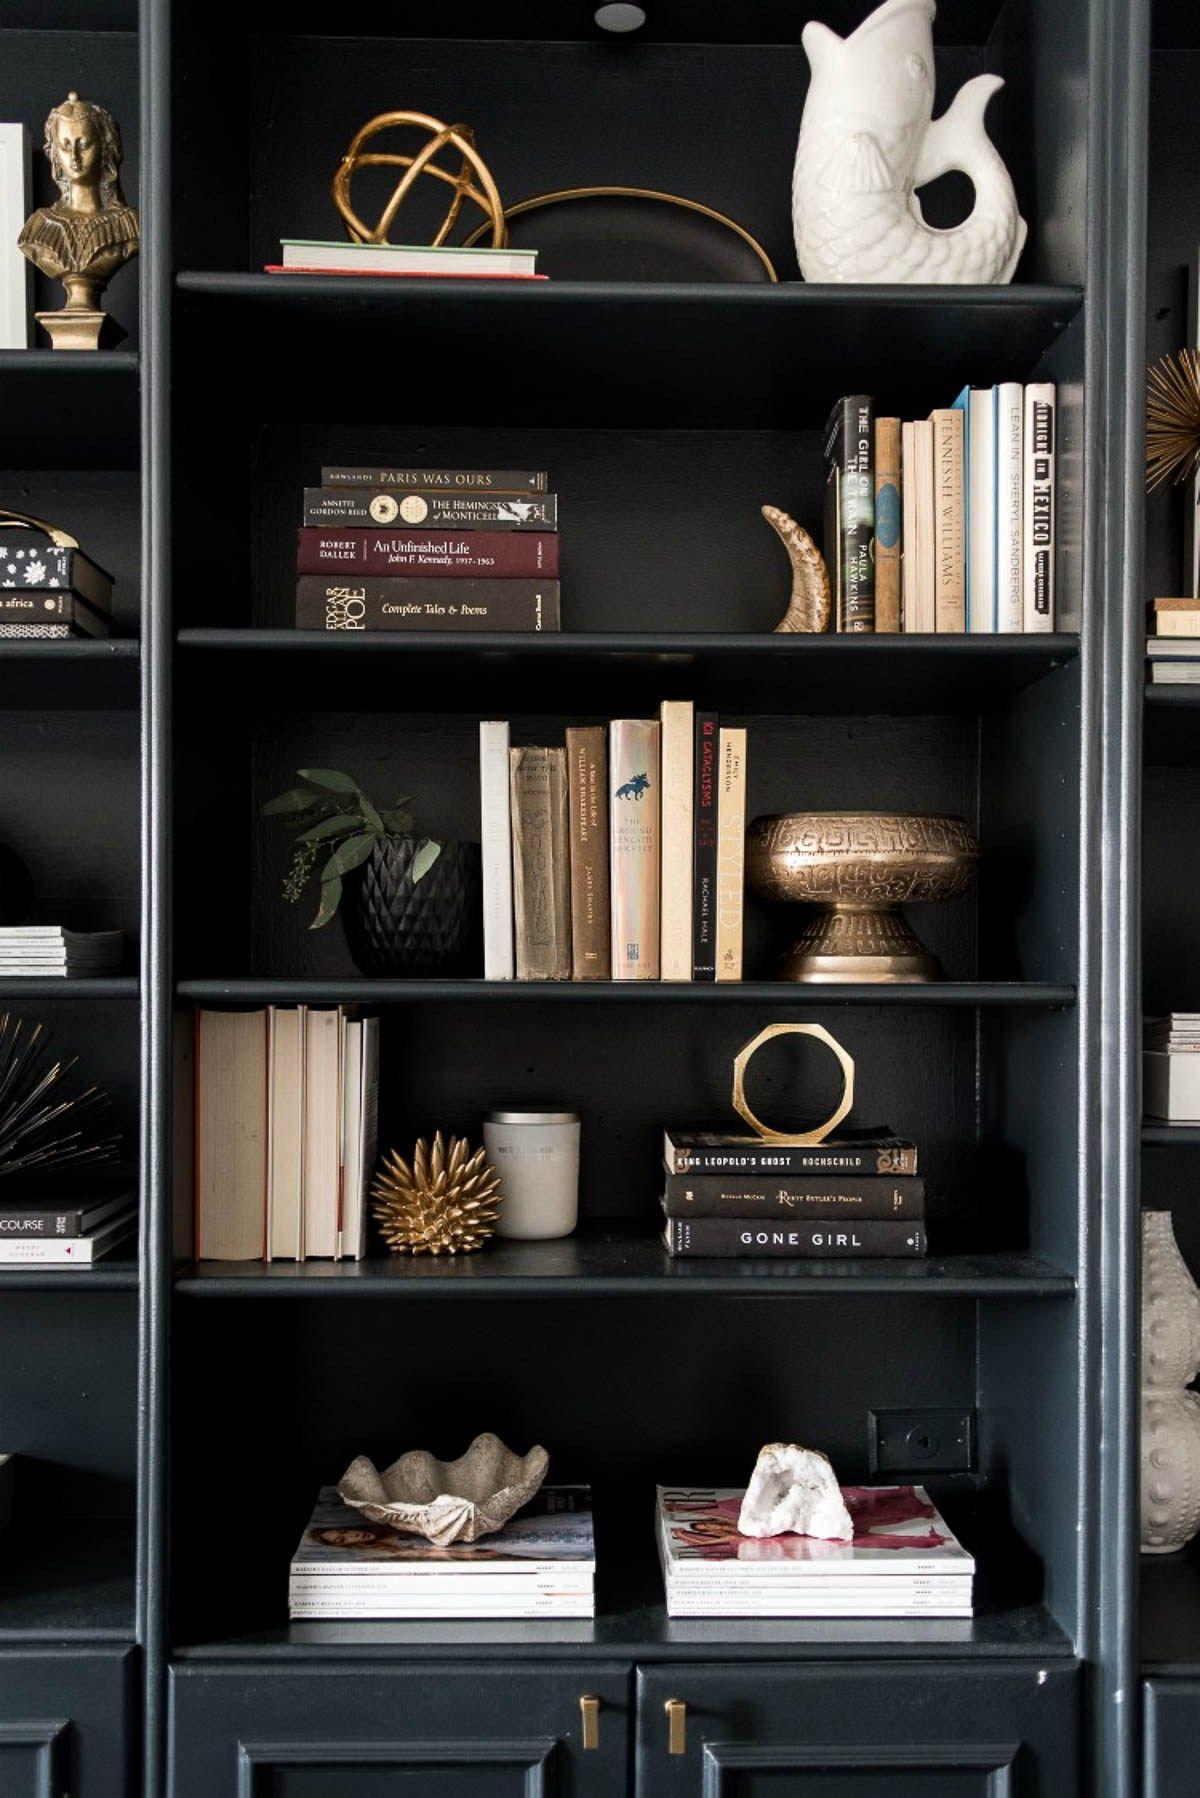 How To Style A Black Bookshelf In 2020 Bookshelf Decor Bookshelf Styling Bookshelf Design